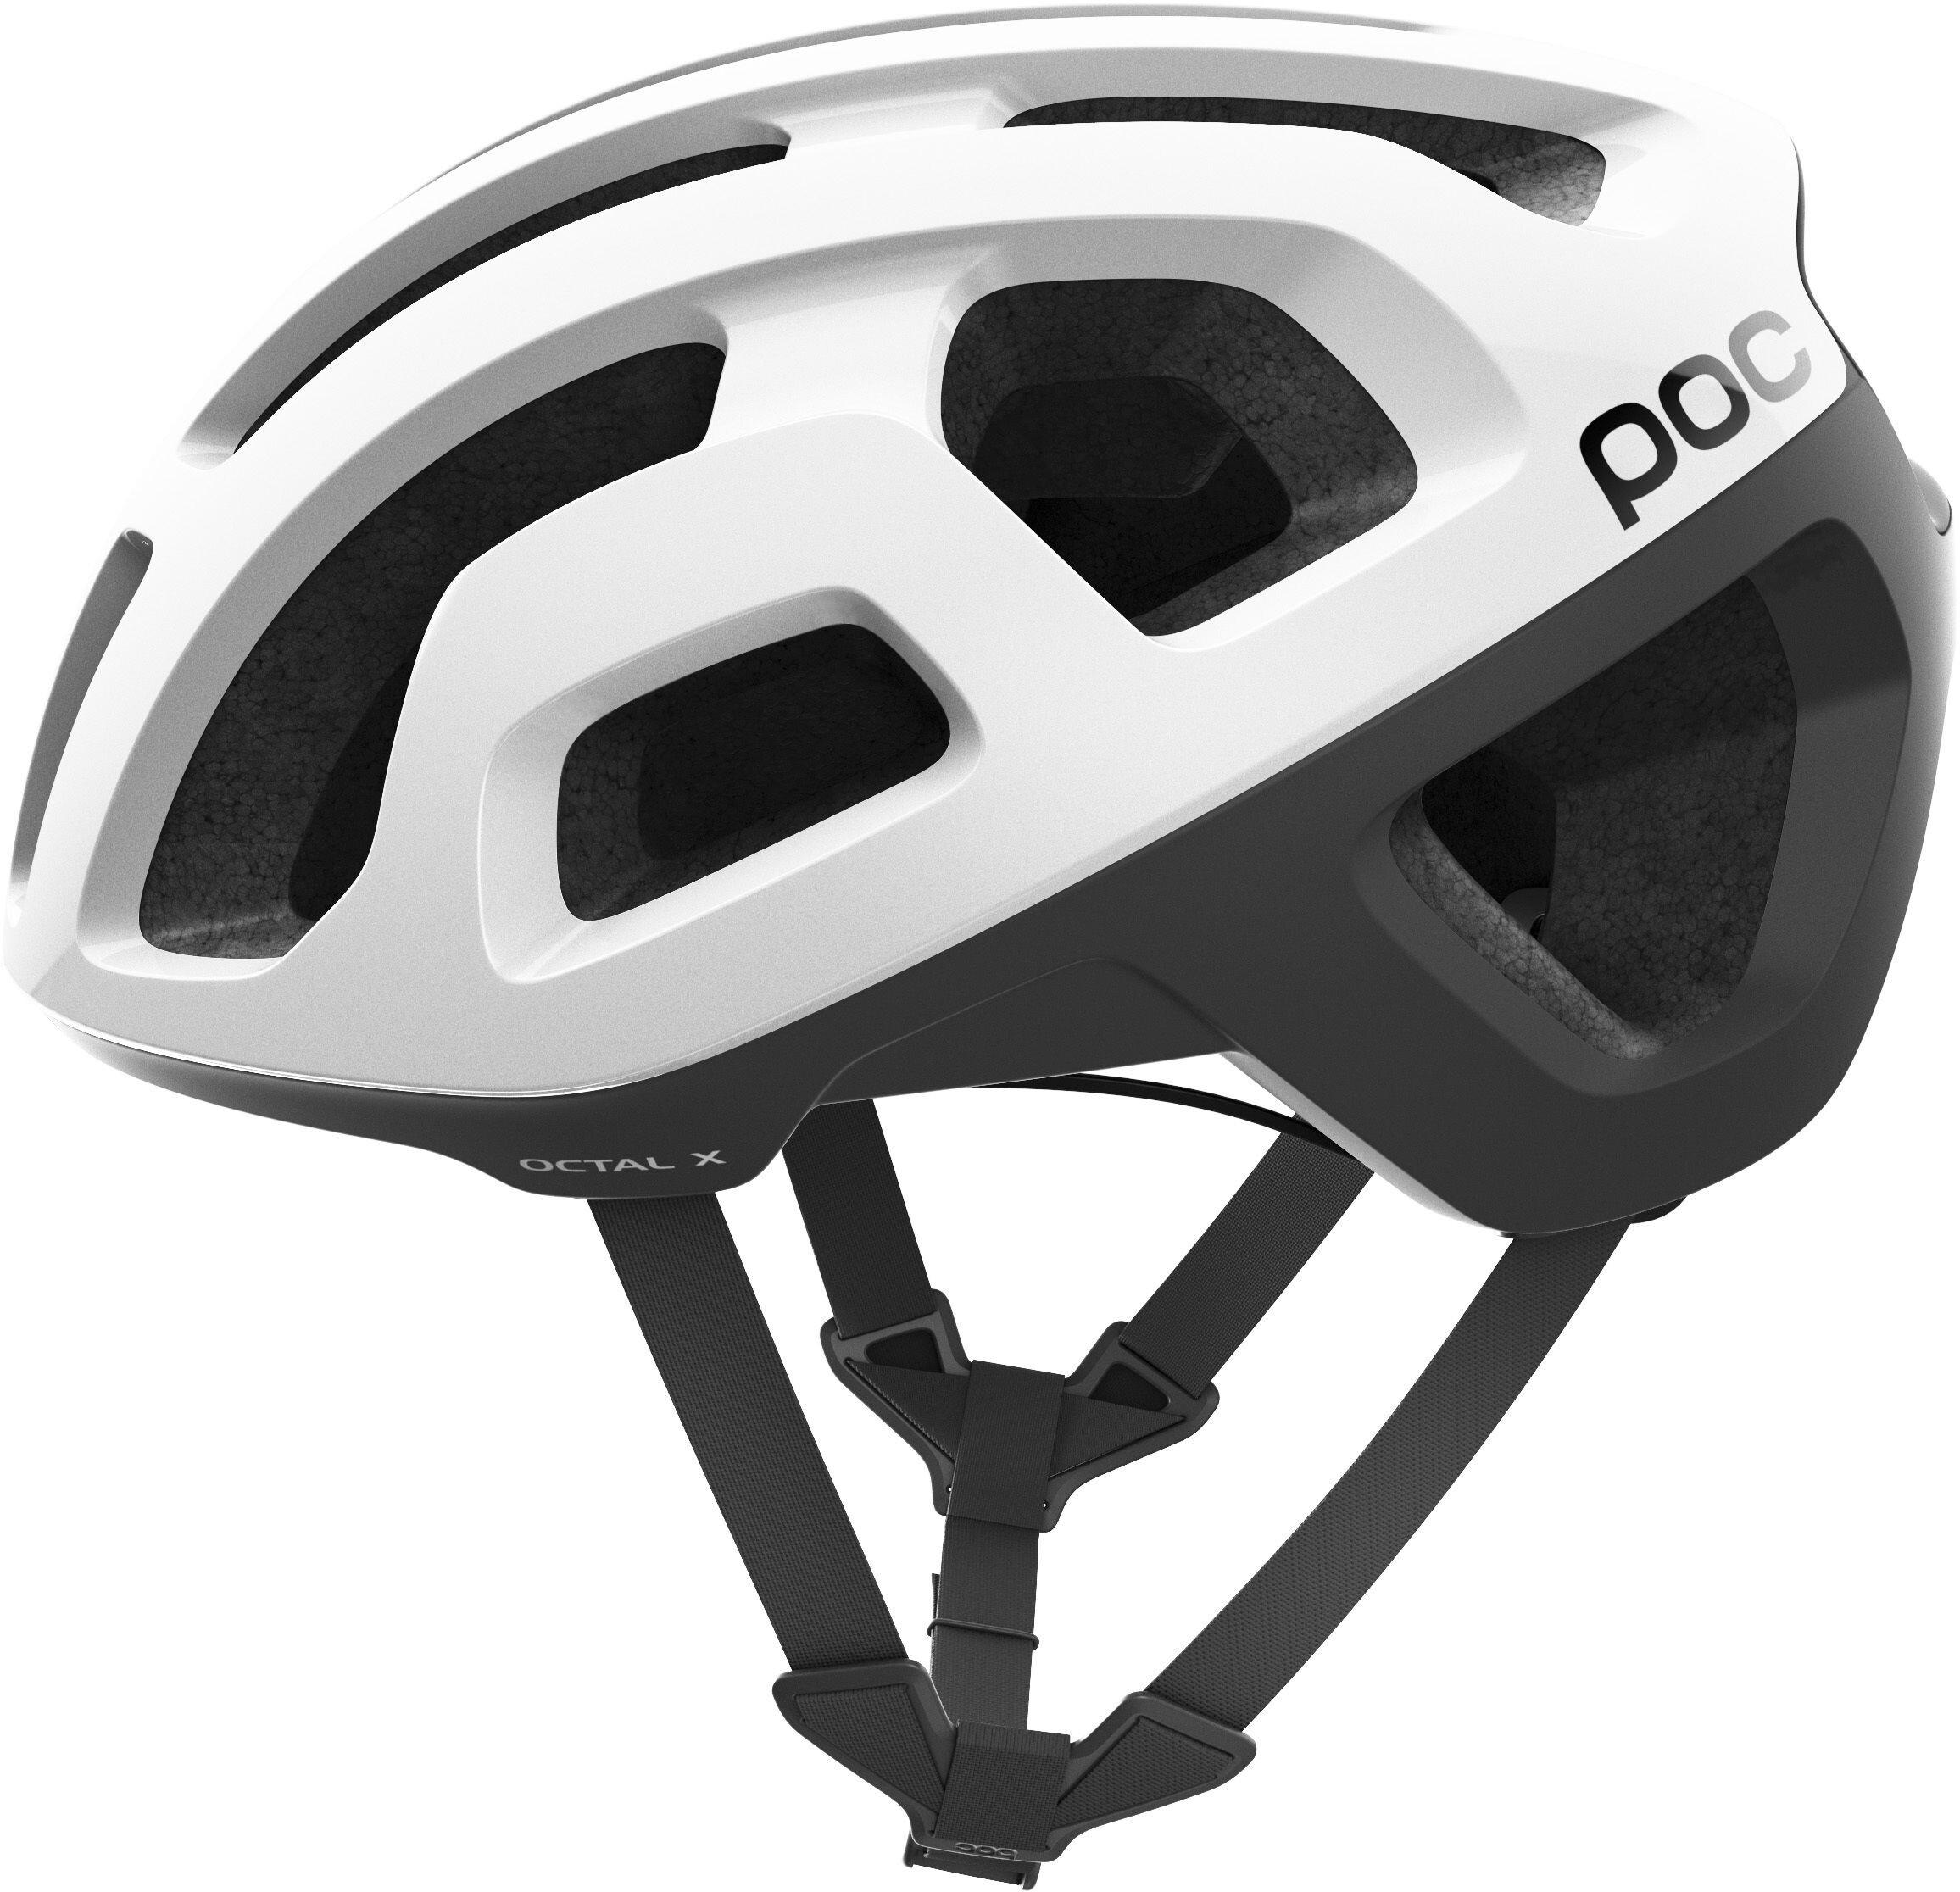 poc octal x spin helmet hydrogen white online kaufen. Black Bedroom Furniture Sets. Home Design Ideas